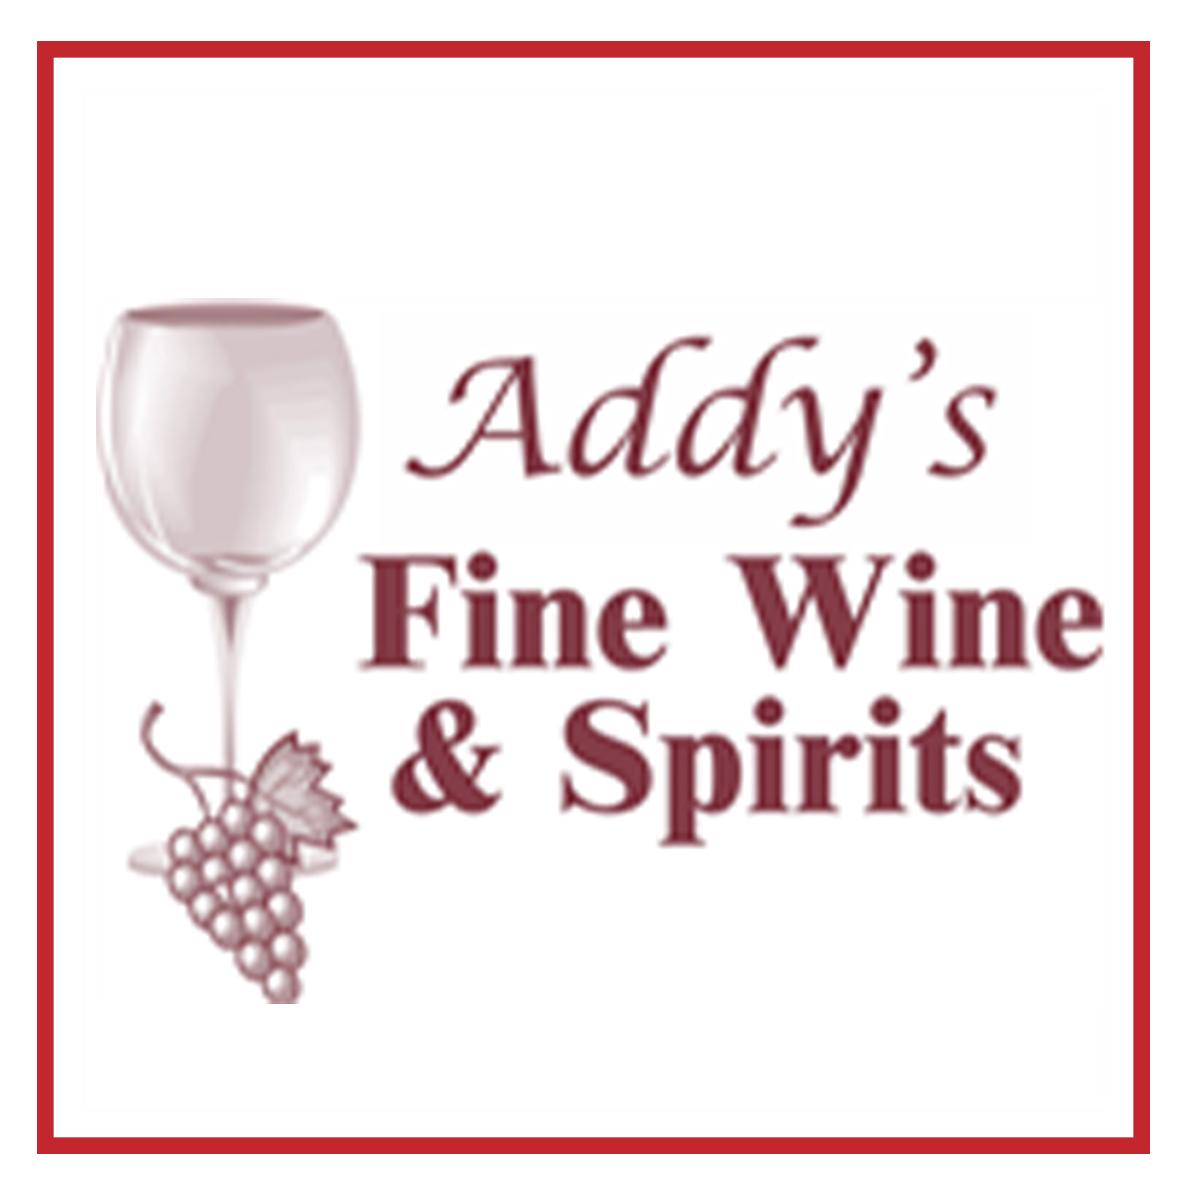 Addy's Fine Wine & Spirits